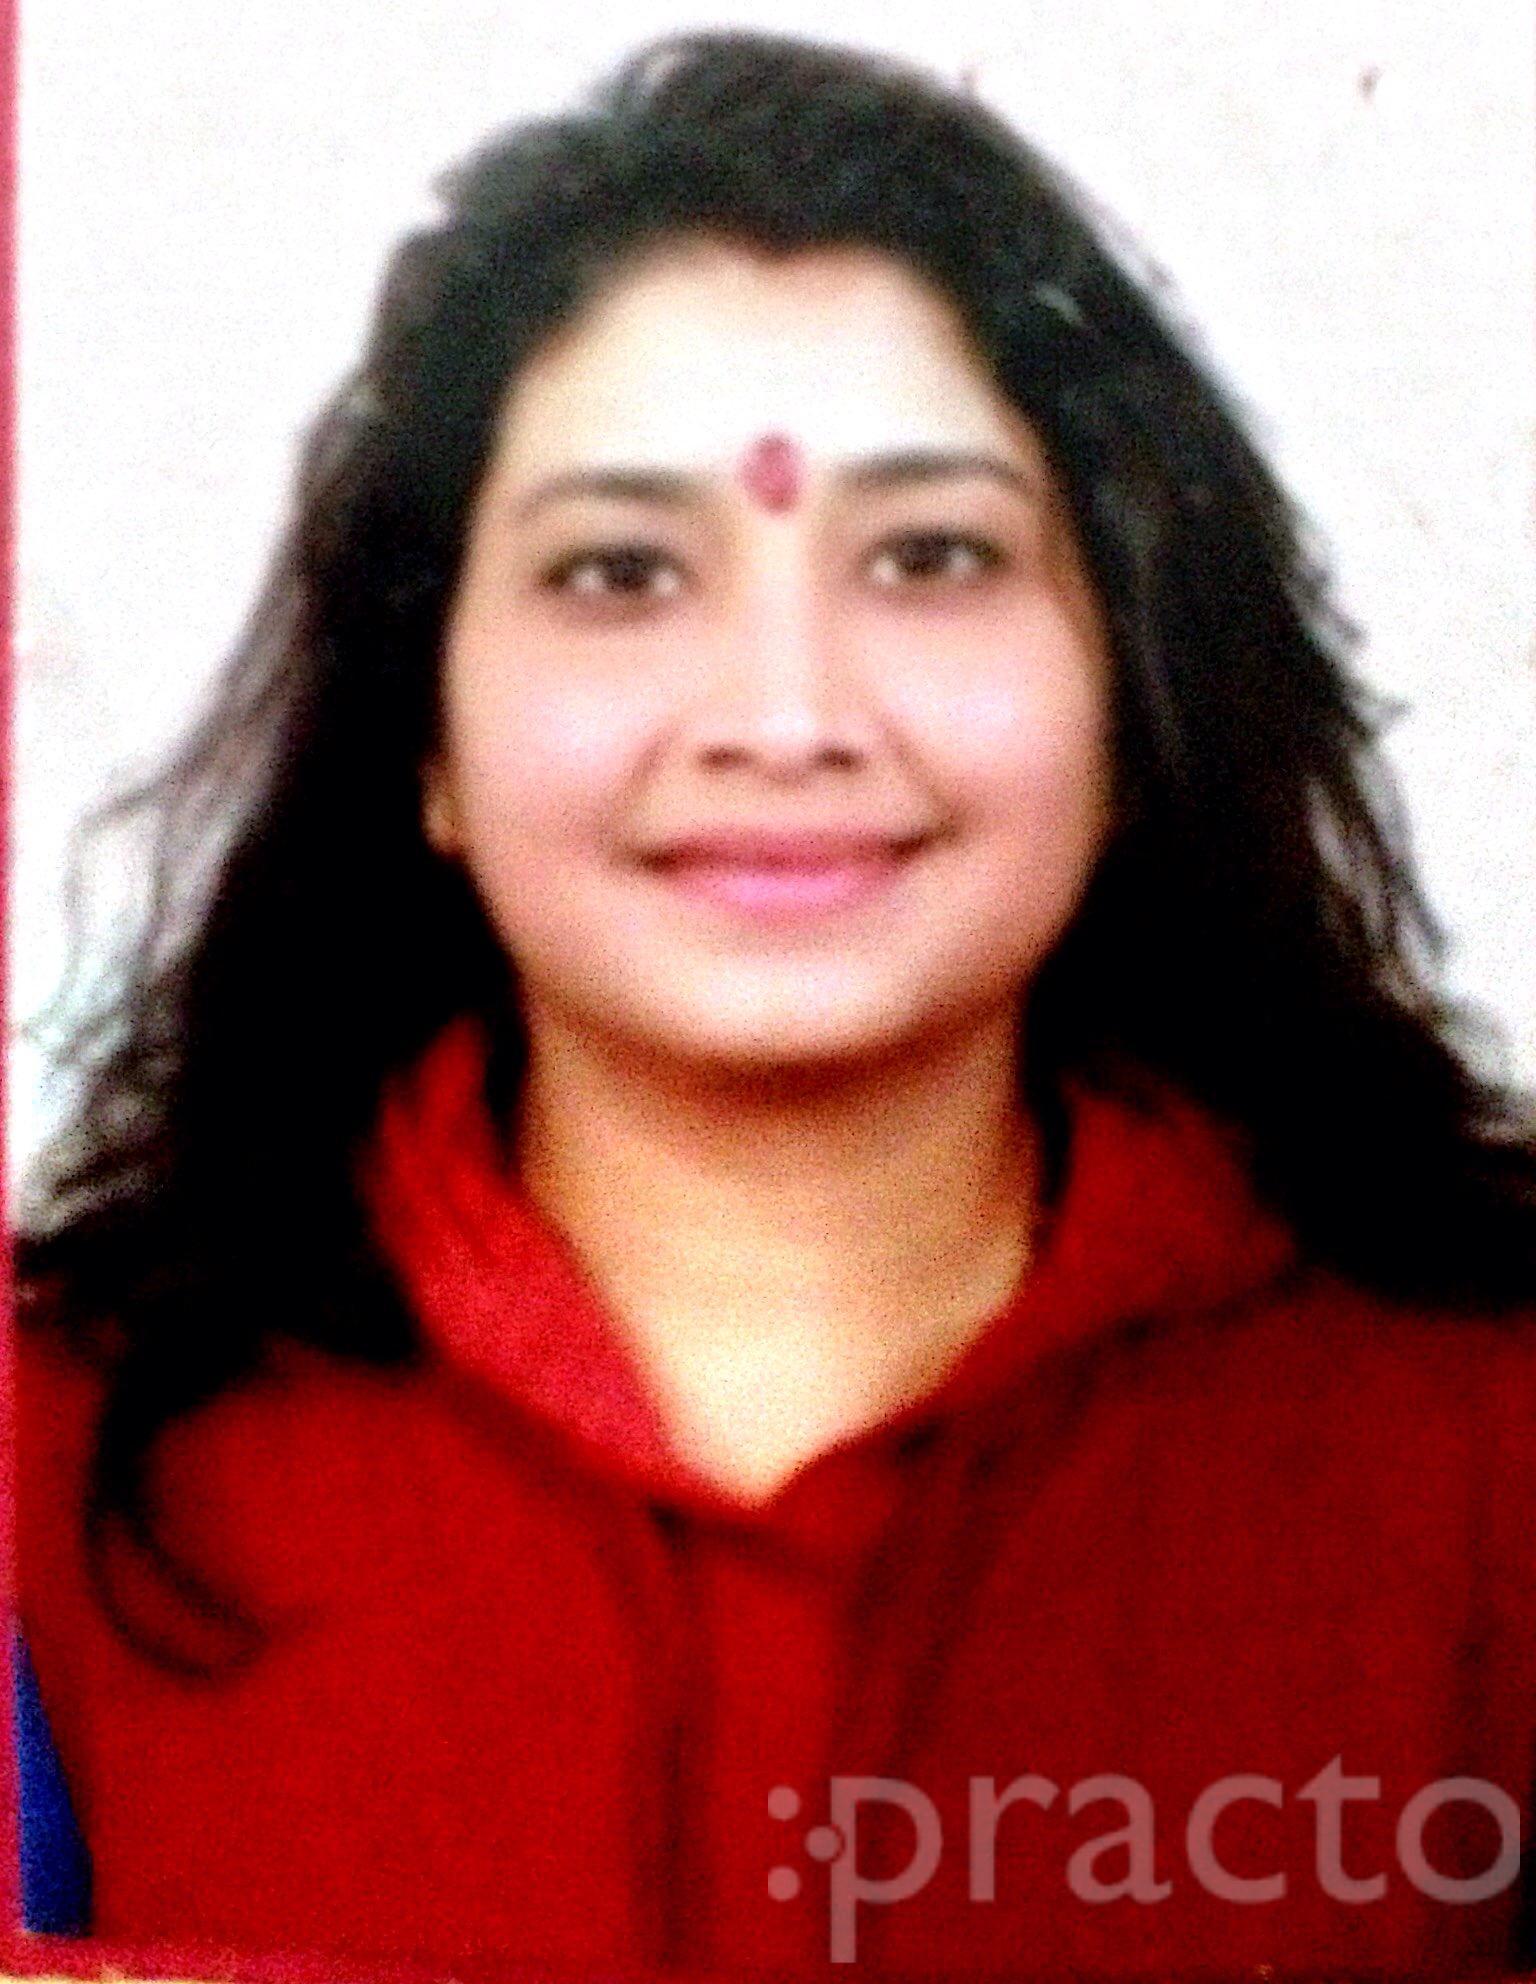 Dr. Anika Srivastava - Gynecologist/Obstetrician